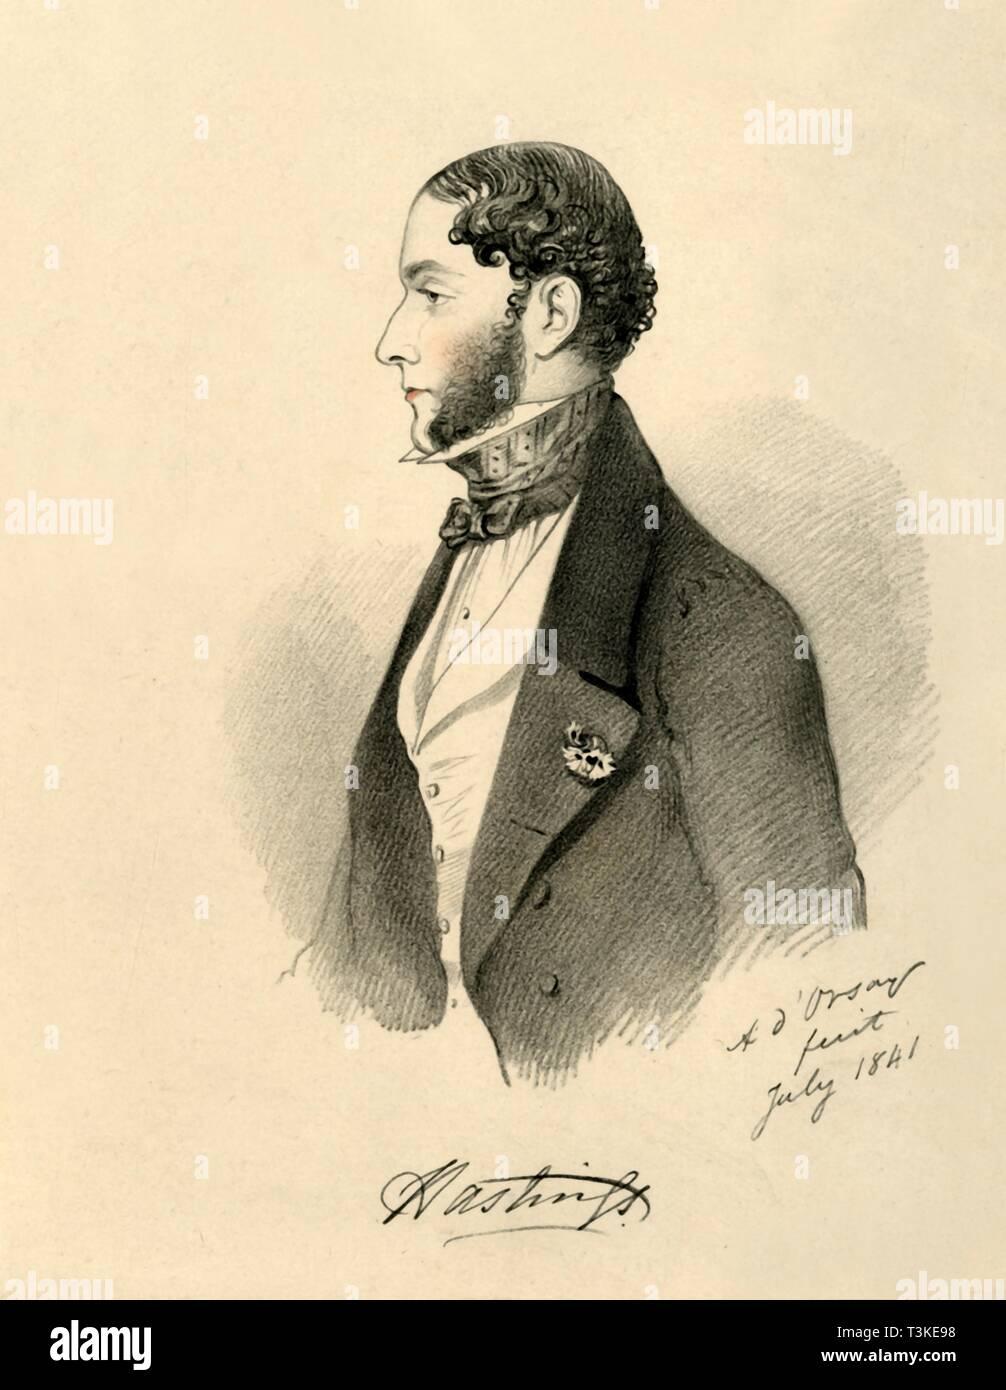 'The Marquis of Hastings', 1841. Creator: Richard James Lane. - Stock Image